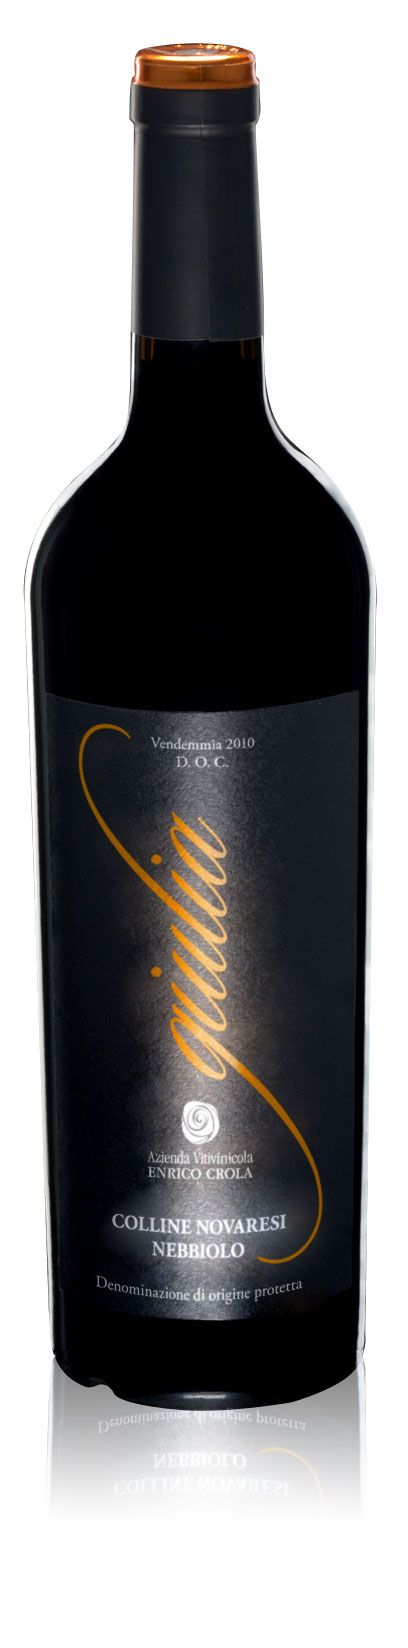 Colline Novaresi Nebbiolo Giulia, Looking for Wine Distributors/Importers, Wine from Italy seeking for distributors